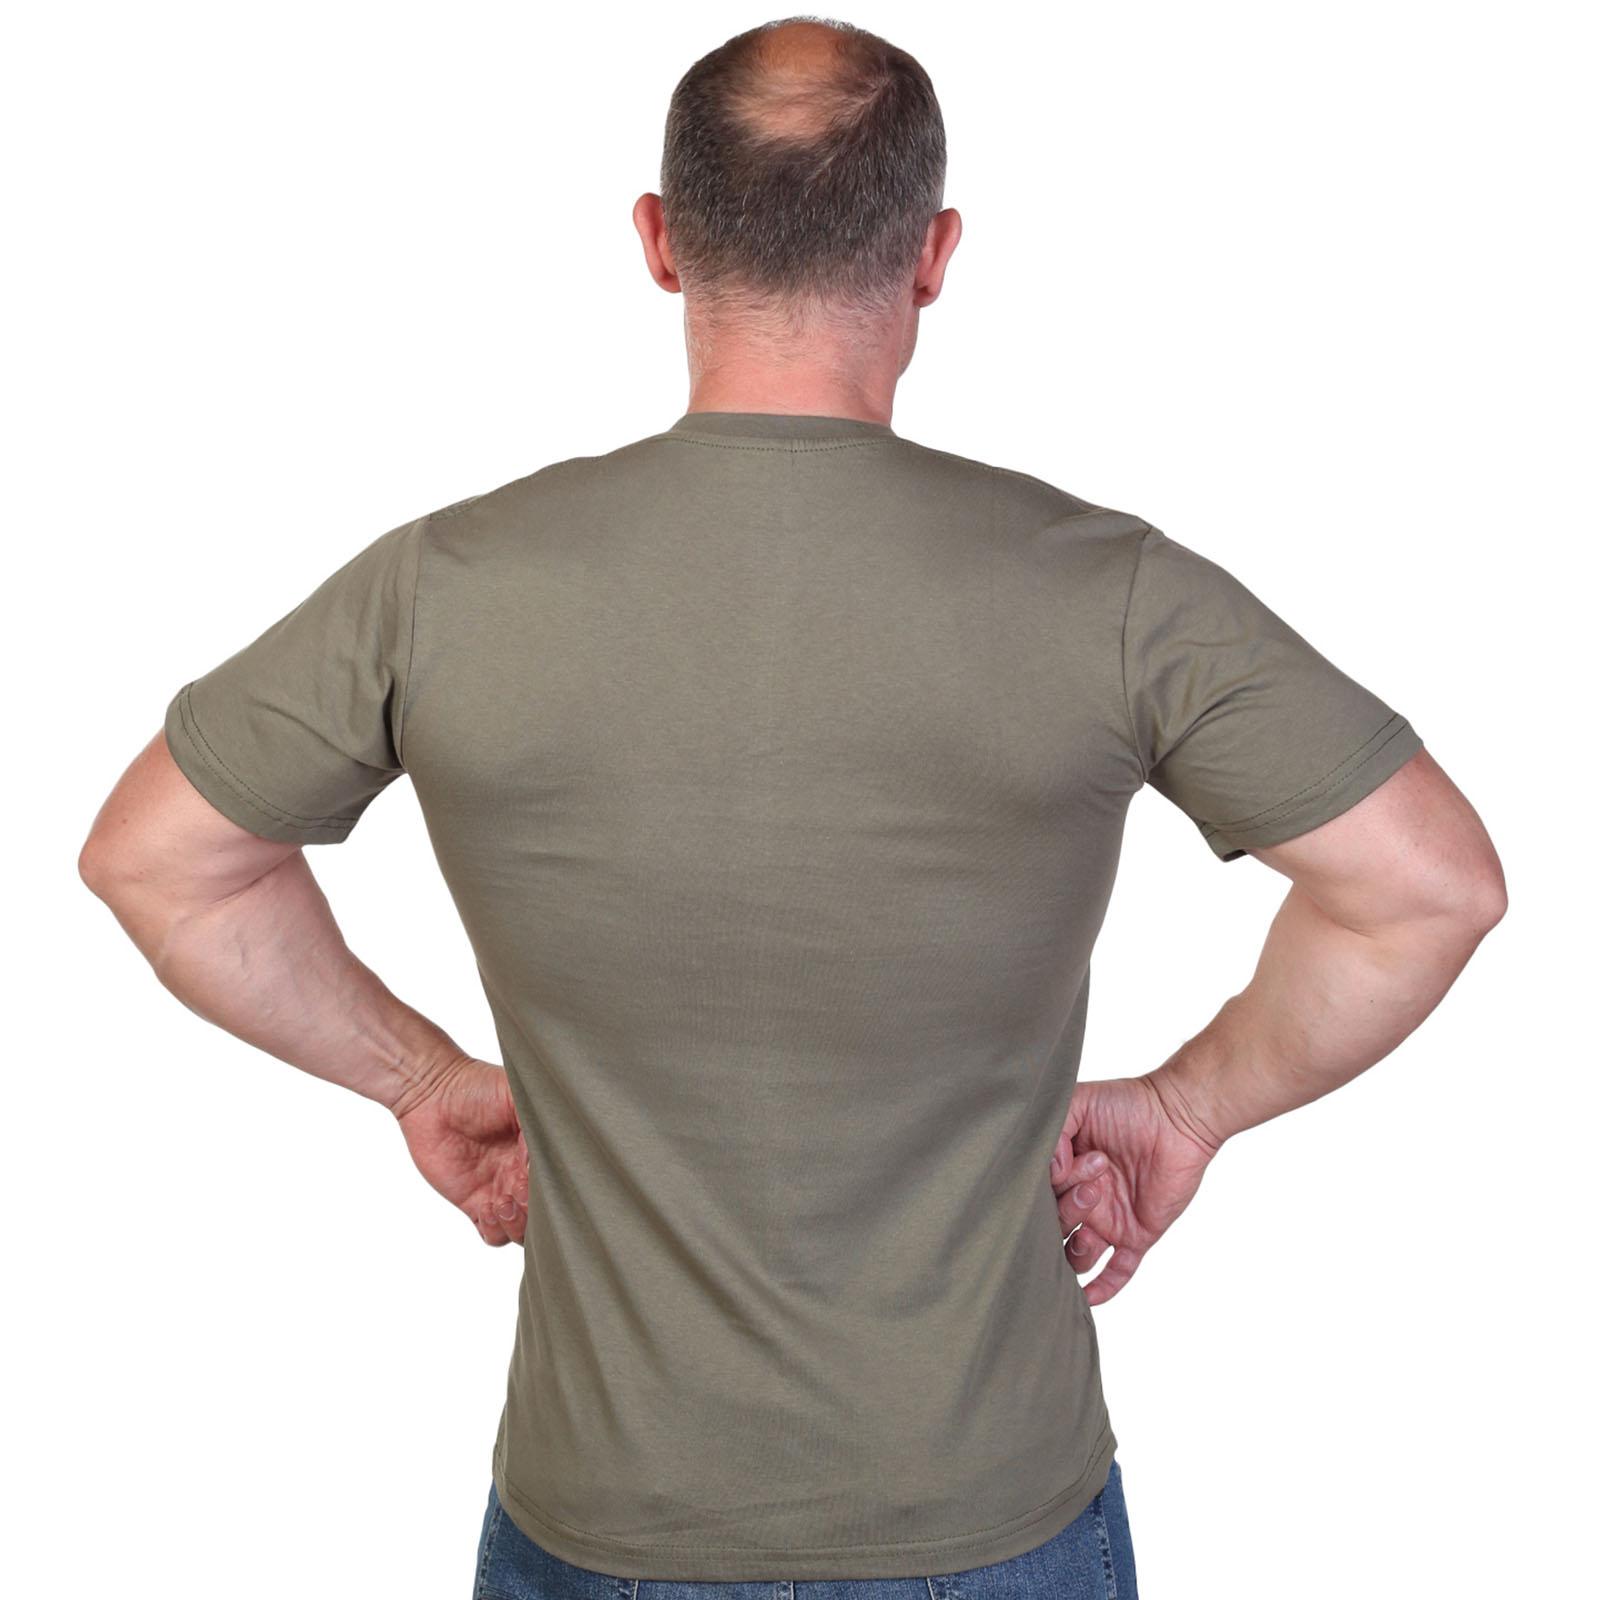 Оливковая футболка с термотрансфером Разведки ВДВ